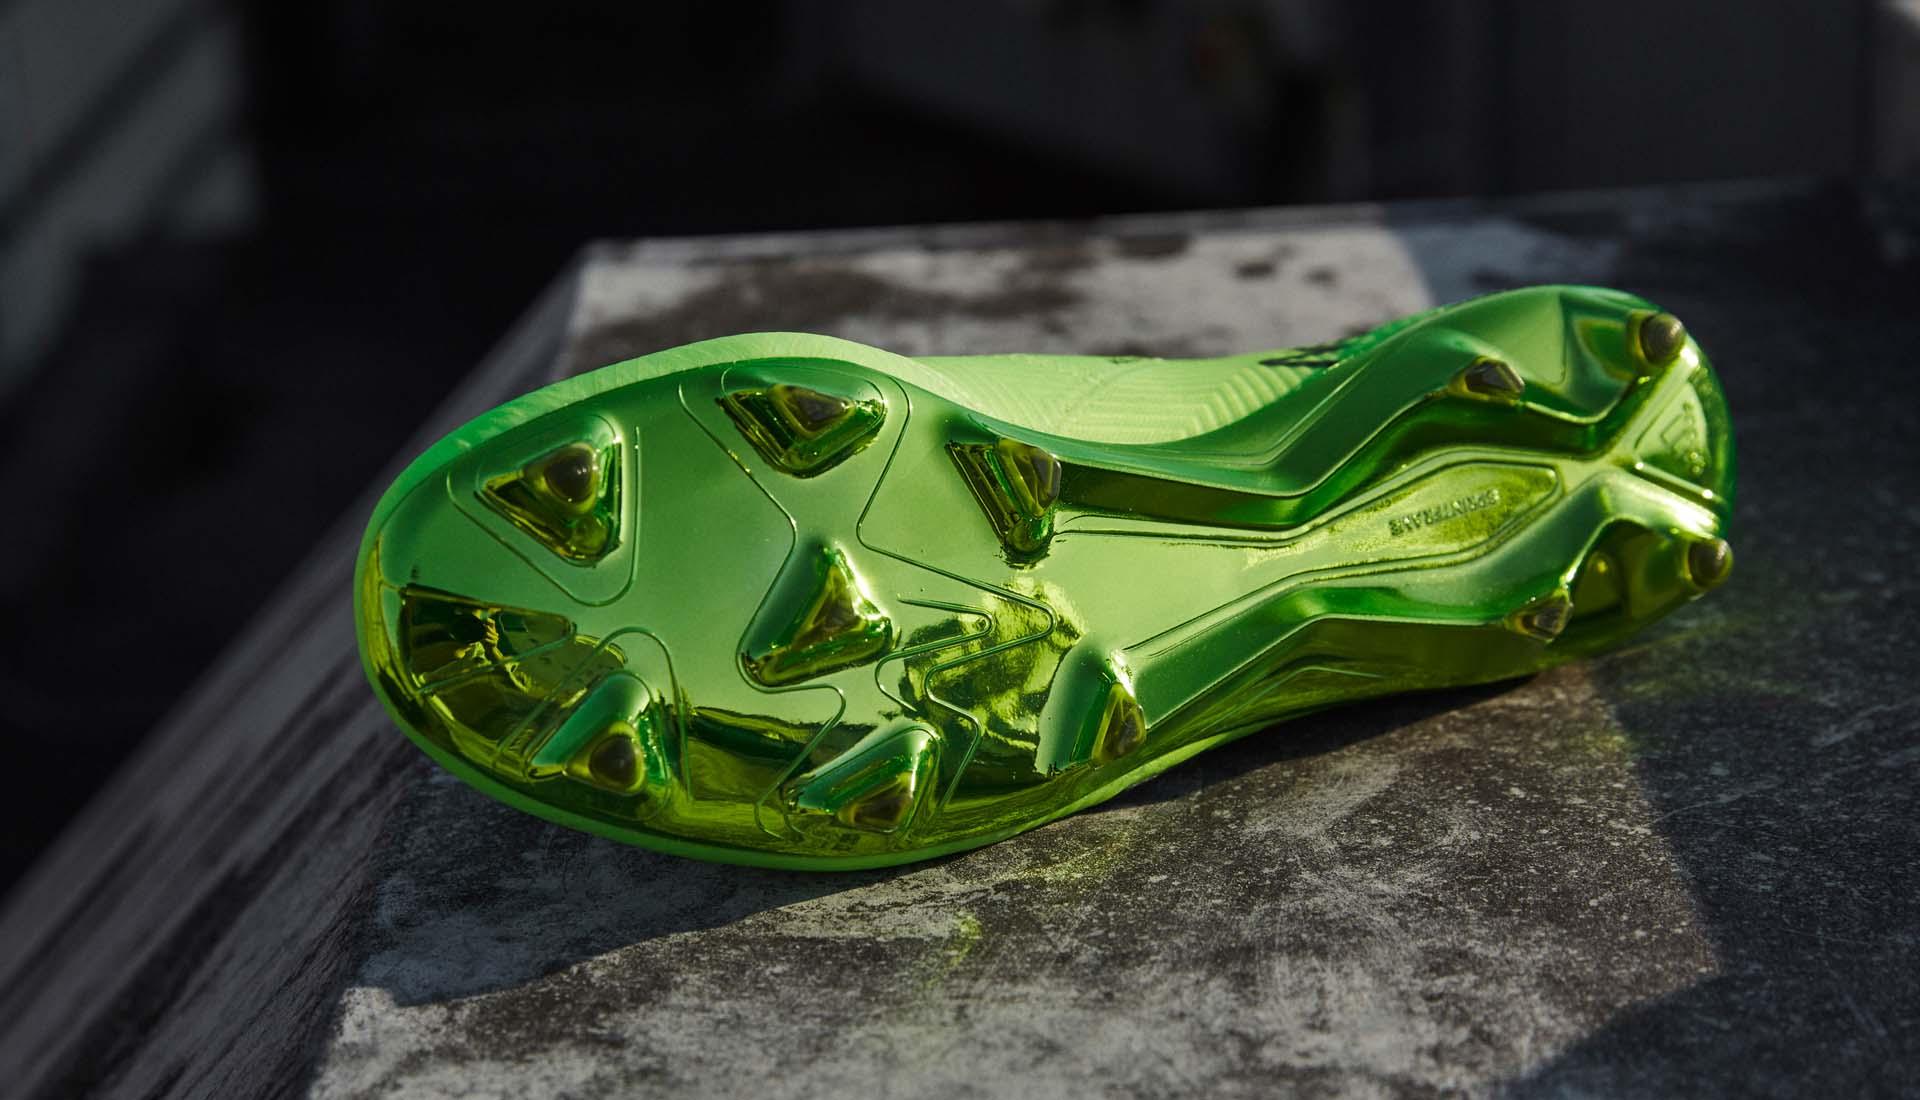 3-adidas-nemeziz-messi-energy-mode.jpg